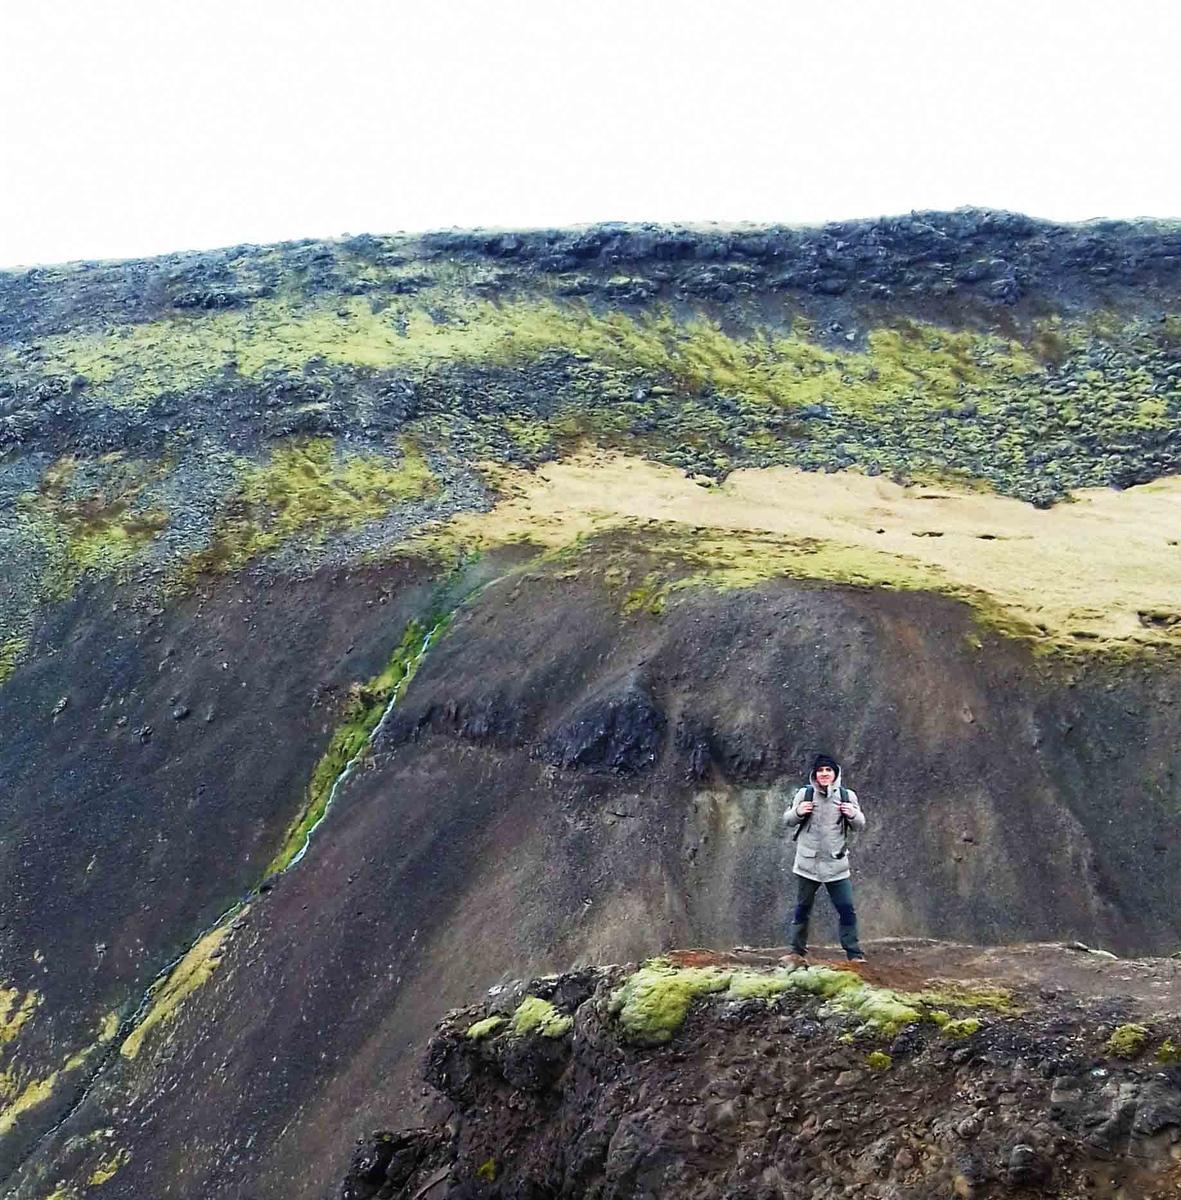 Valle de Reykjadalur, Islandia